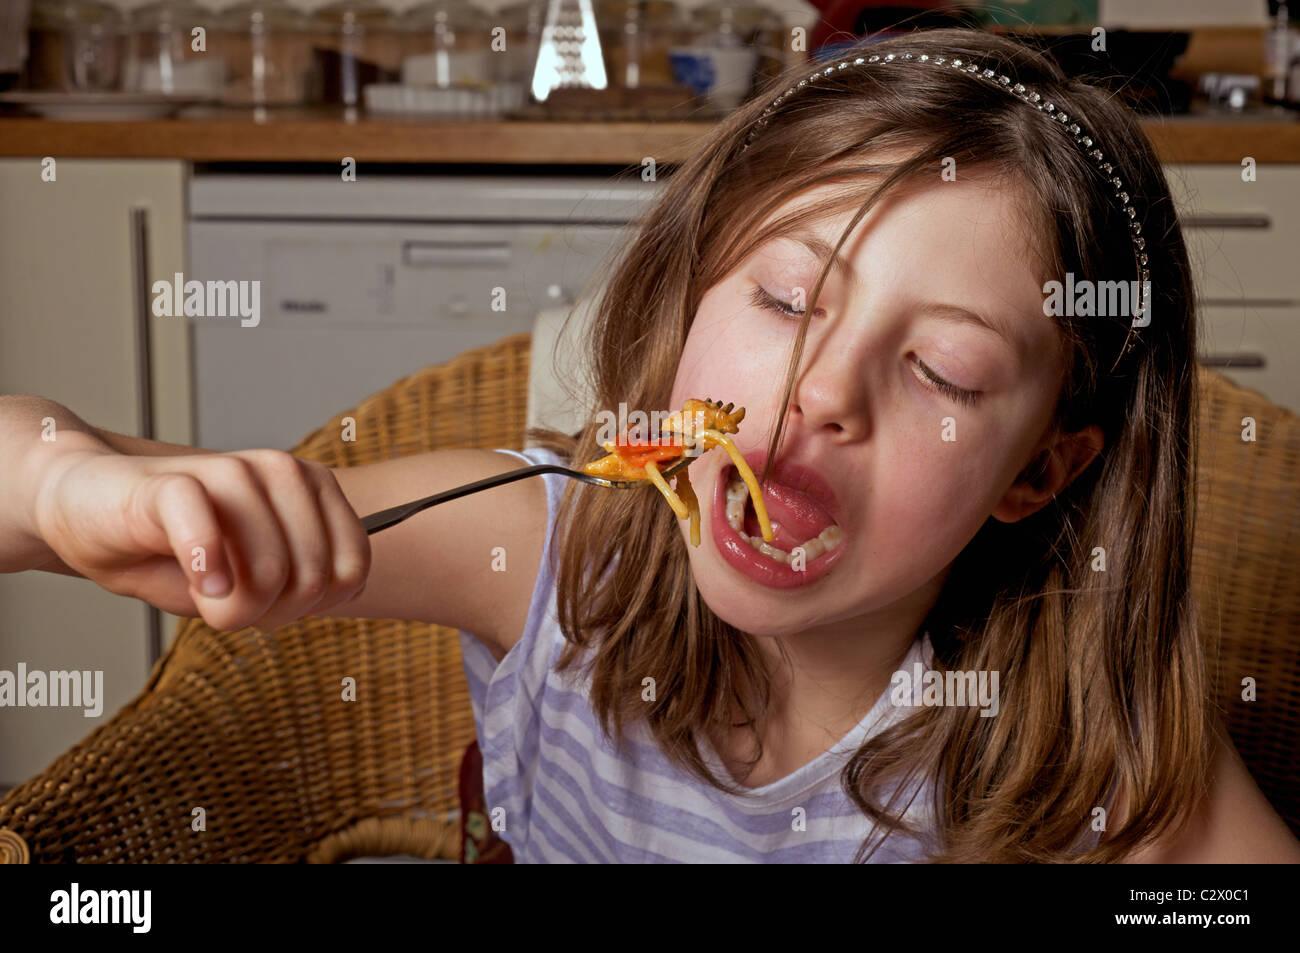 Young British girl eating spaghetti - Stock Image